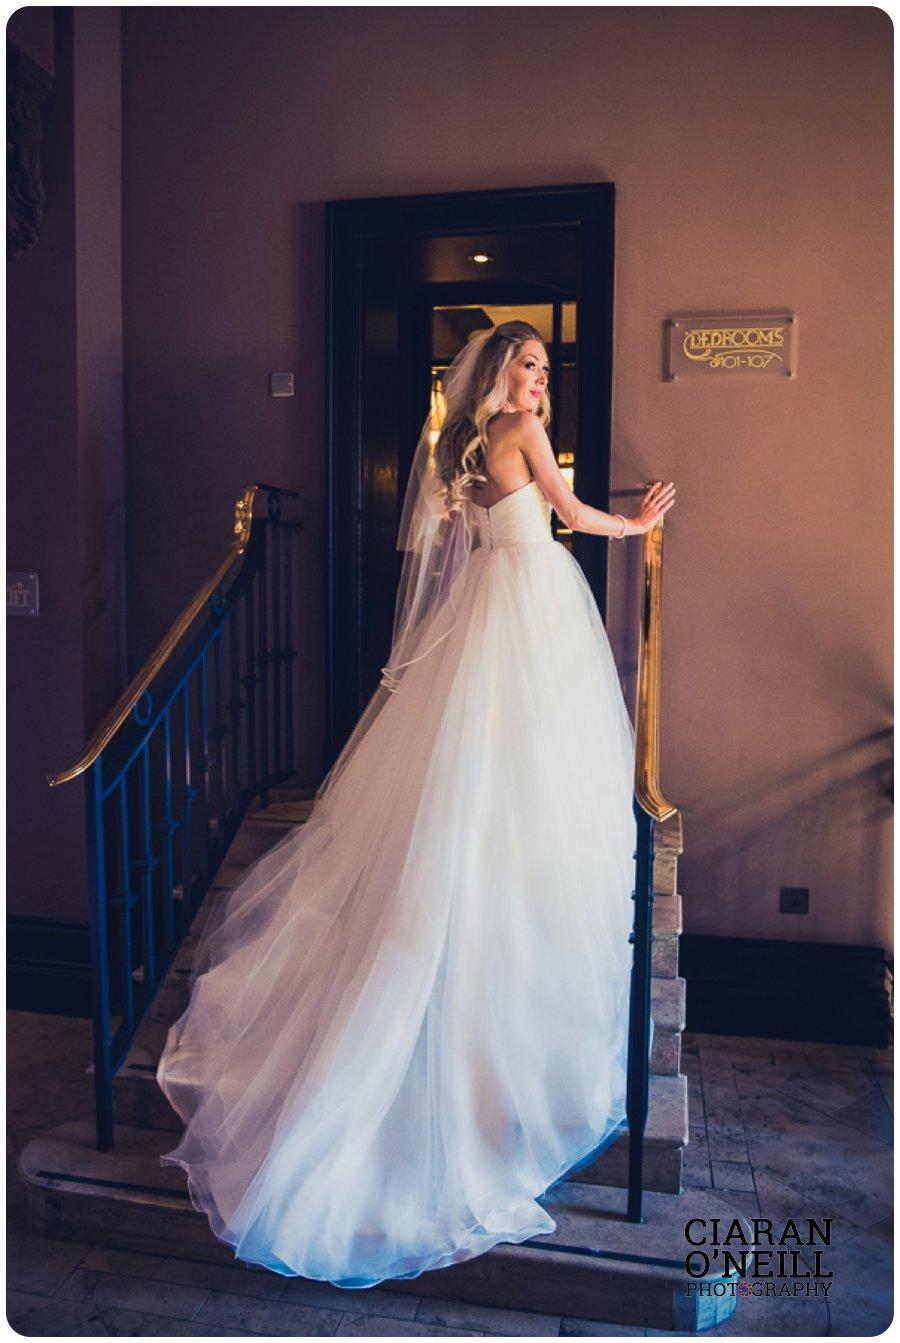 Linda & Jae's wedding at the Merchant Hotel by Ciaran O'Neill Photography 22